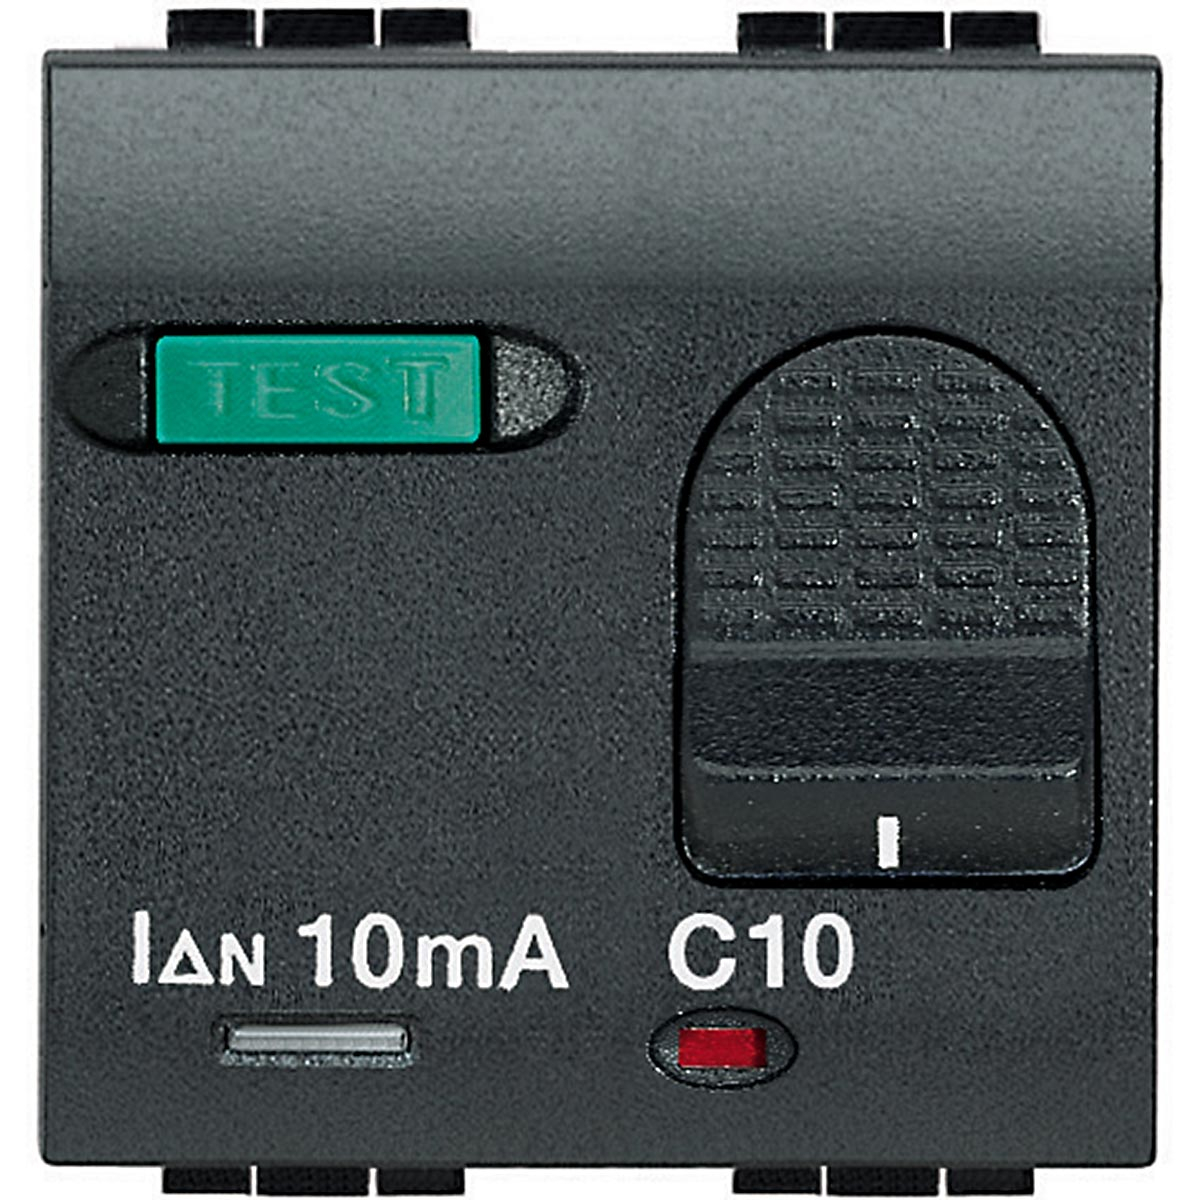 Magnetotermico Differenziale Bticino Living International L4305-6